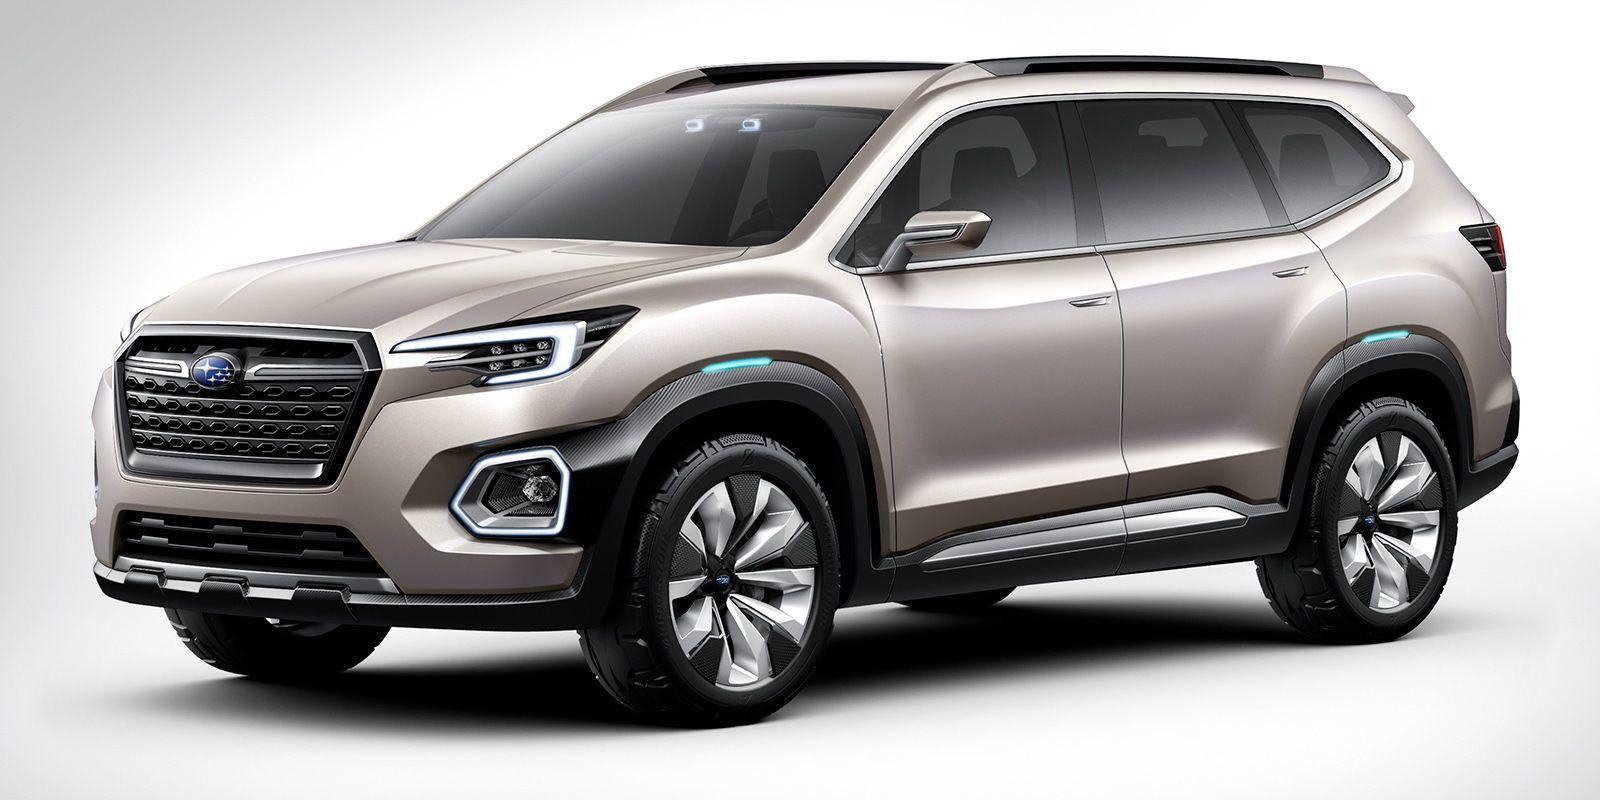 This Seven Seat Suv Will Make Subaru Break More Sales Records Subaru Suv Subaru Tribeca Best Compact Suv